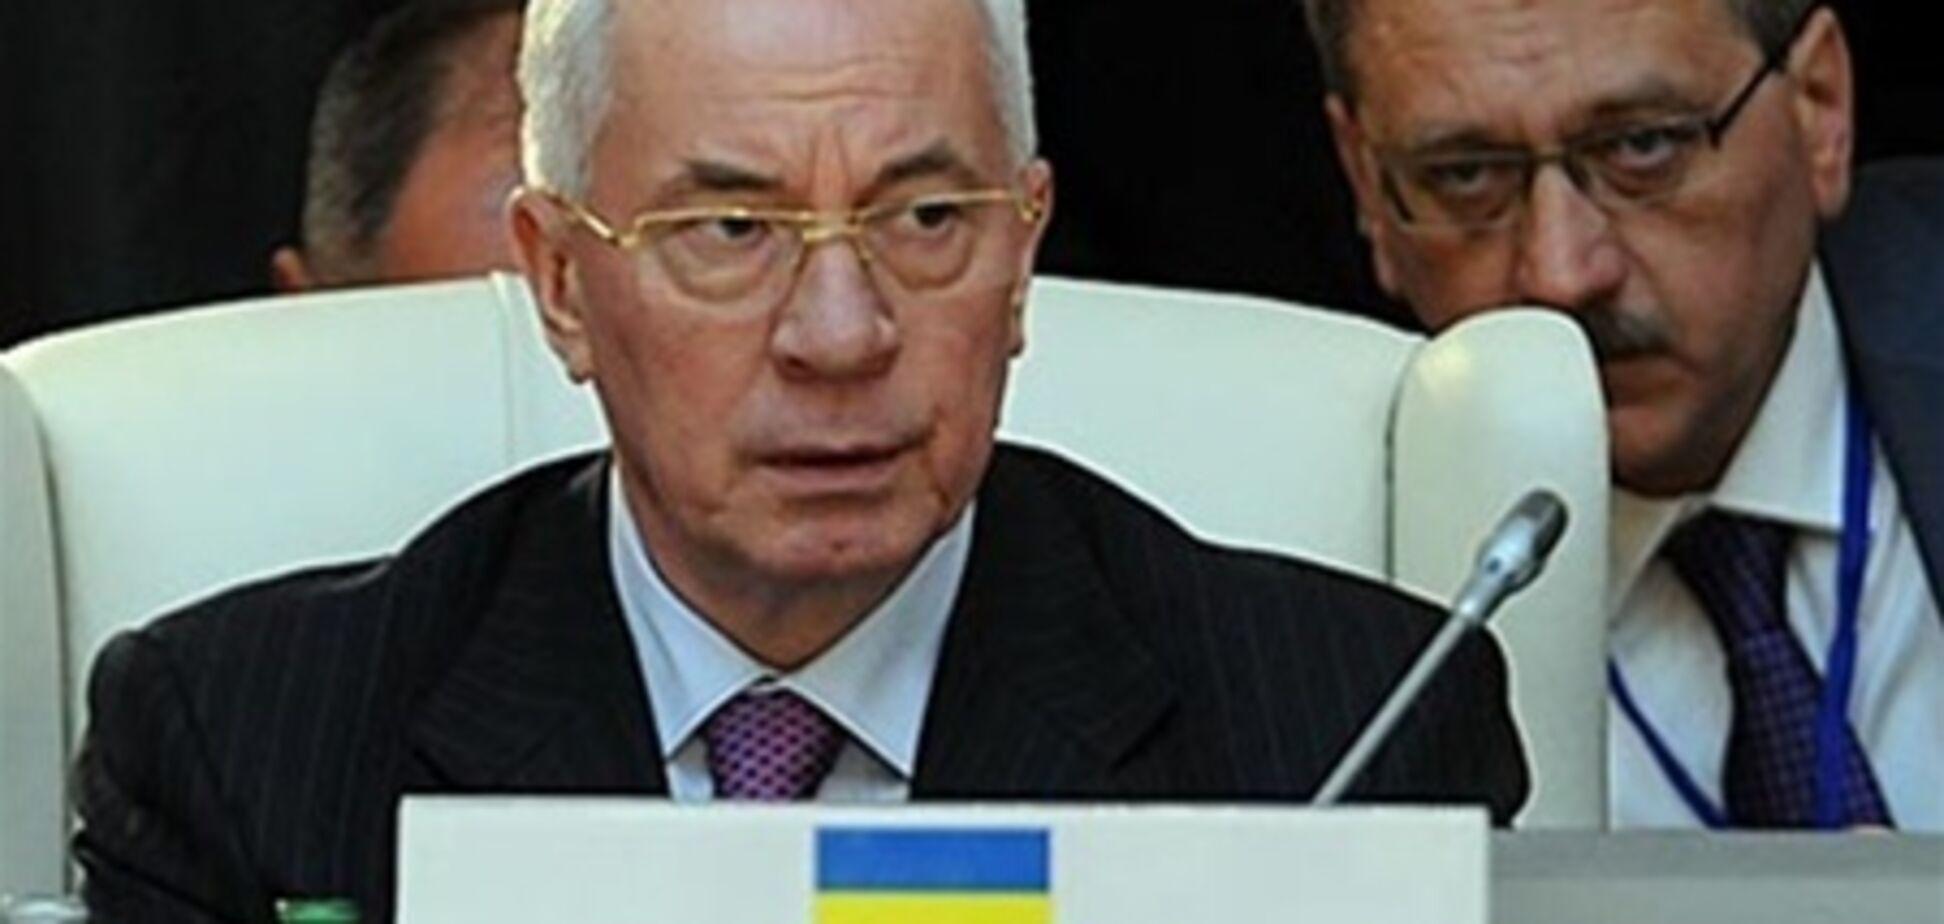 Азаров: меморандум забезпечить Україні фактичний статус спостерігача в МС